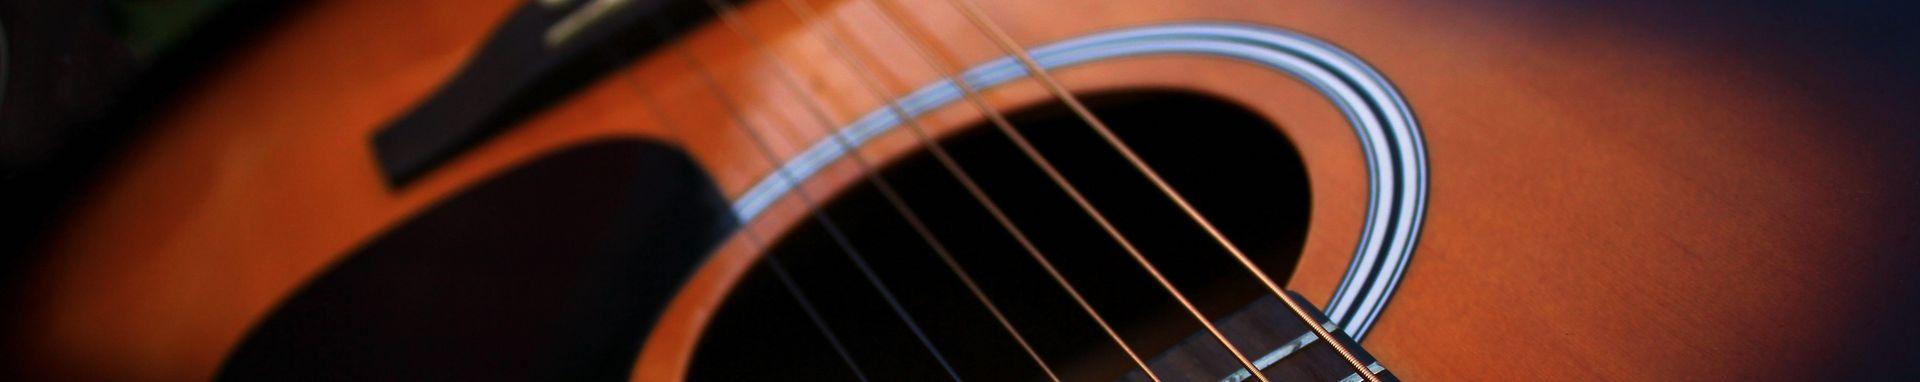 acoustics musical instruments